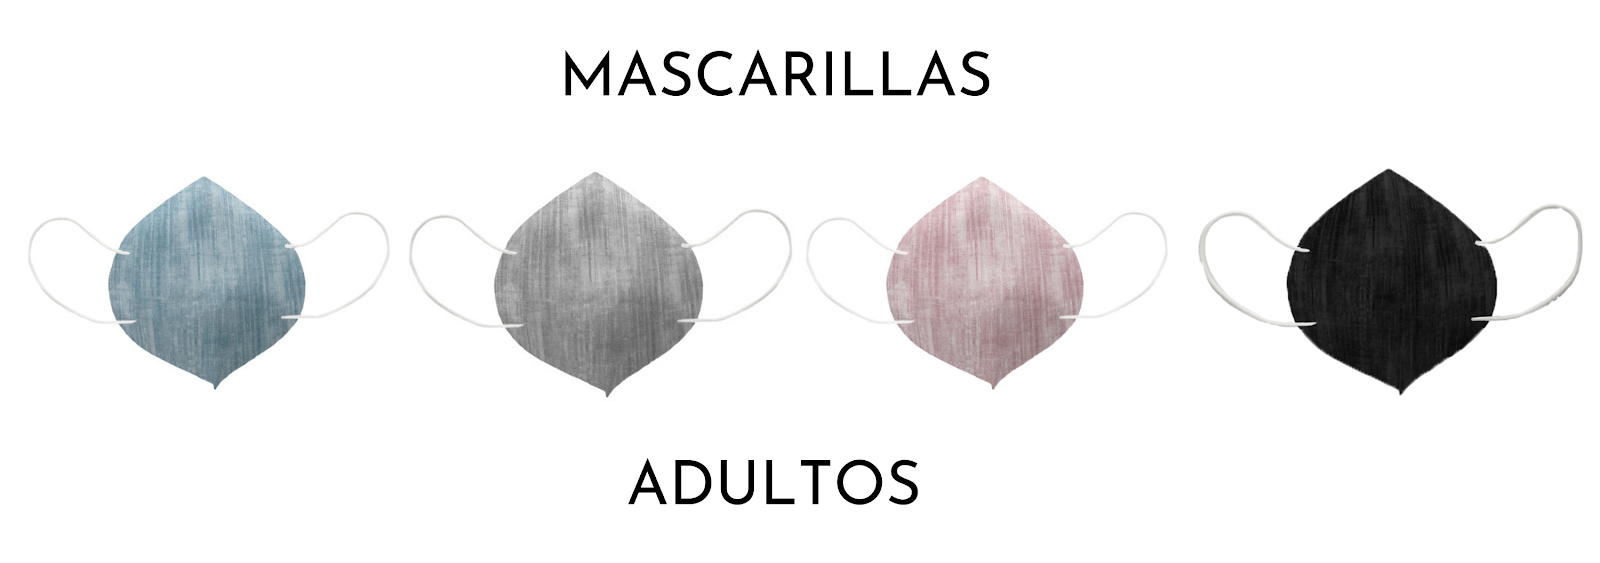 Mascarillas higiénicas homologadas para adultos en alcañíz